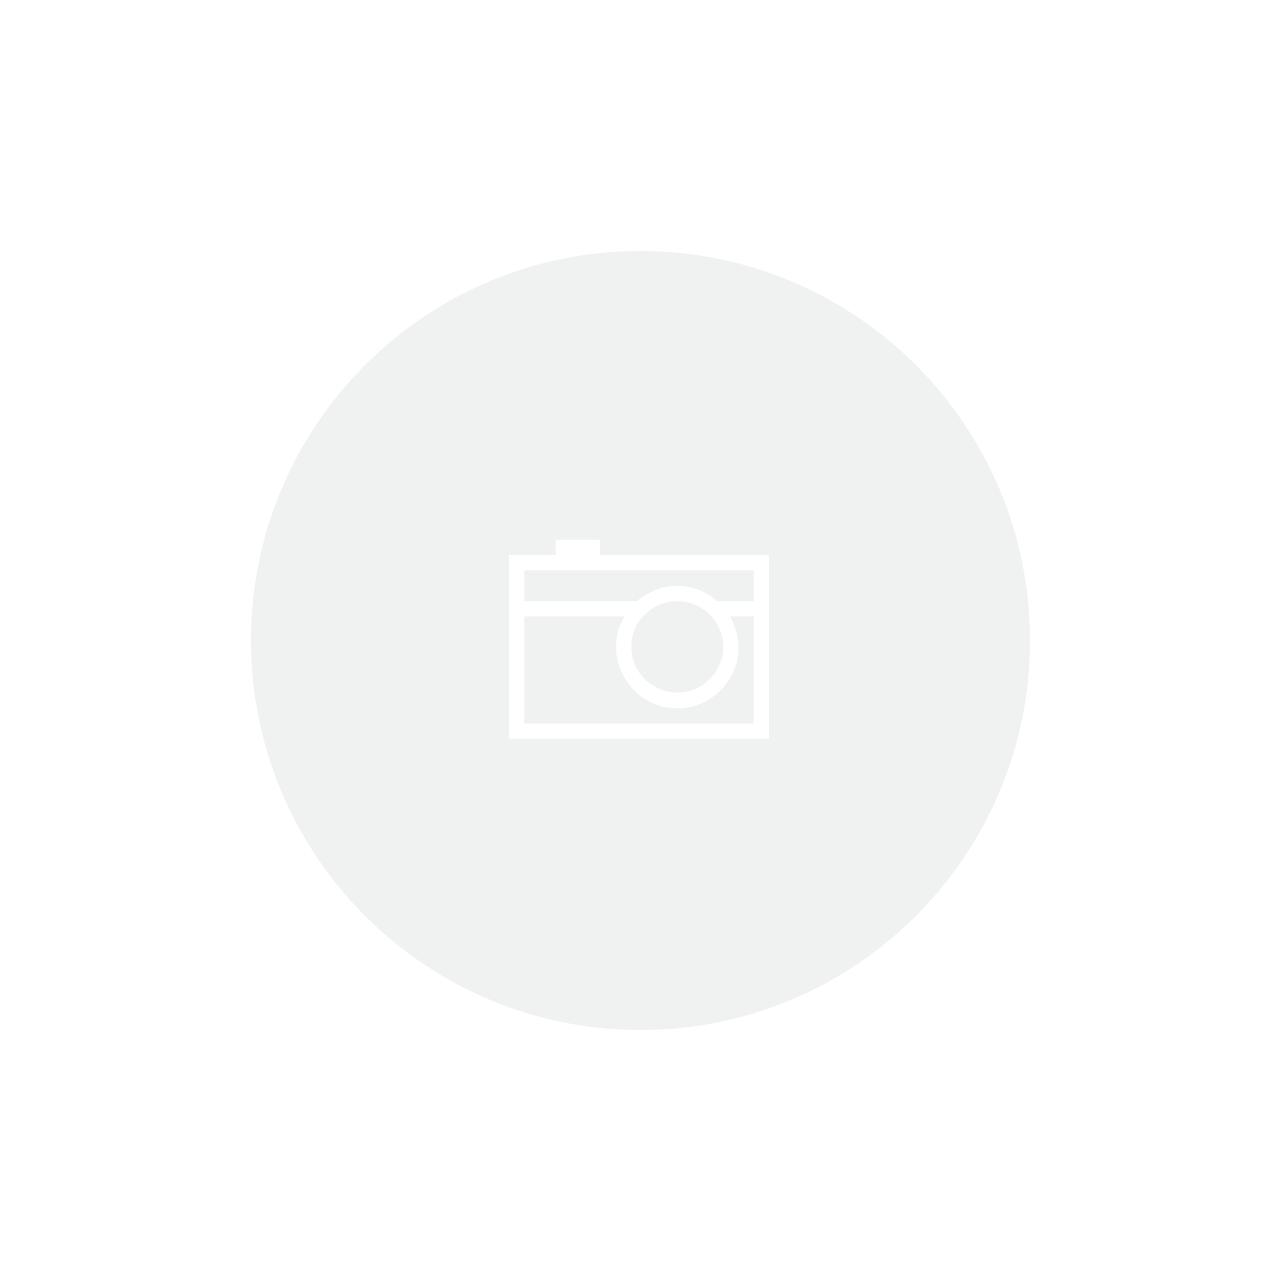 Placa de Vídeo Amd Rx 550 2gb Red Dragon Power Color AXRX 550 2GBD5-DHA/OC